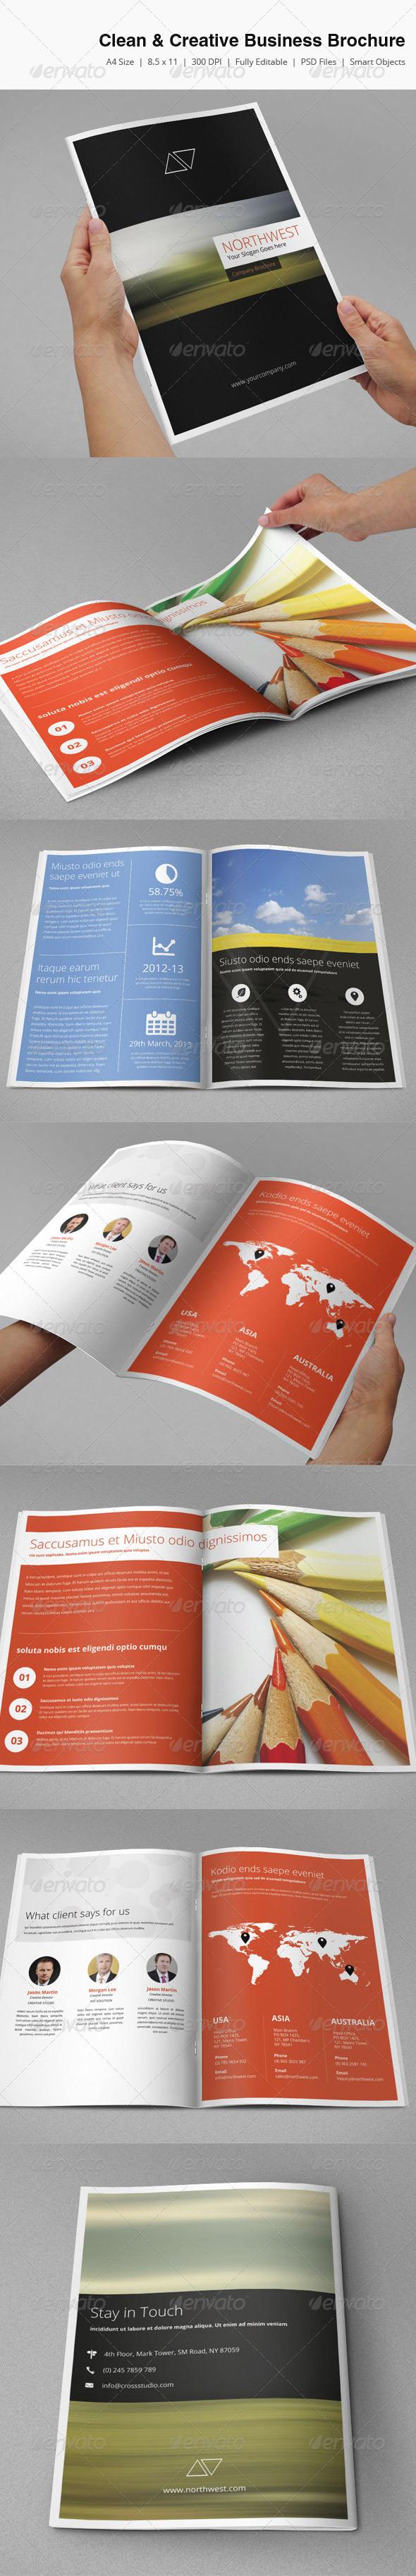 Clean & Creative Business Brochure - Corporate Brochures